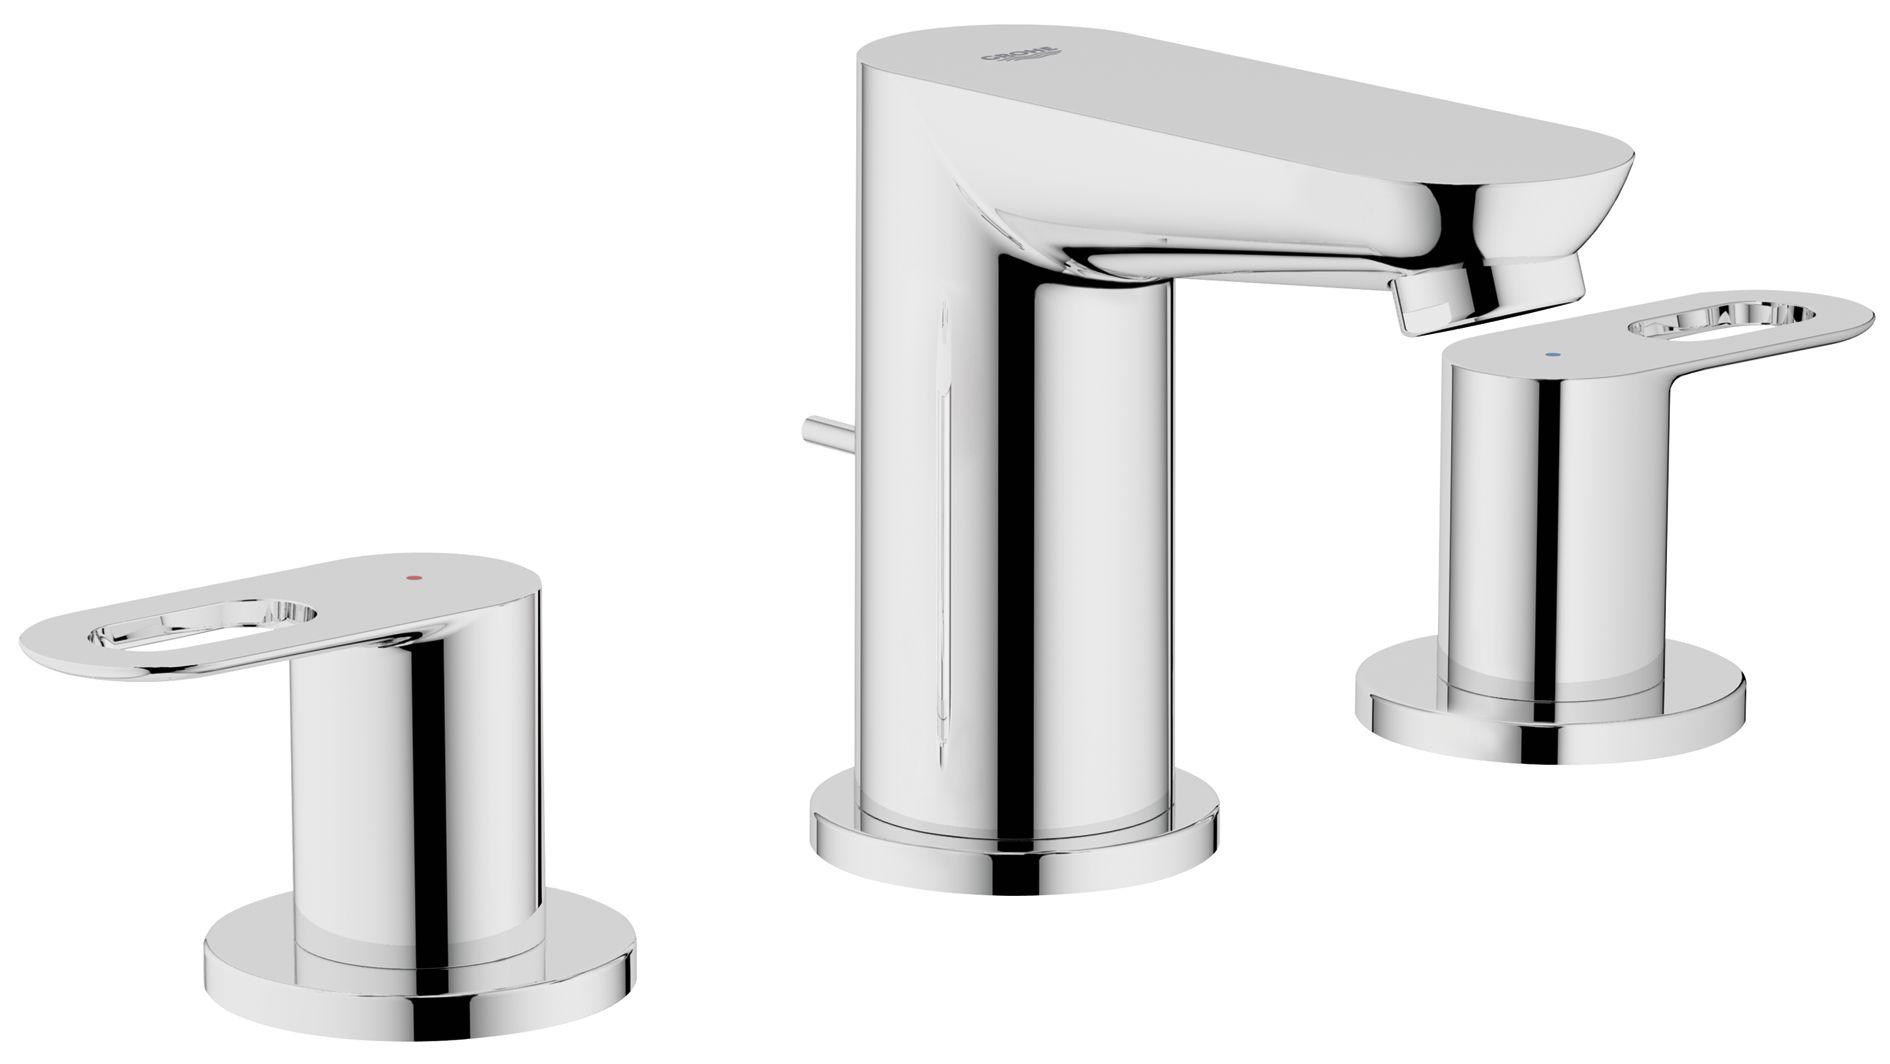 BauLoop 3-hole basin mixer